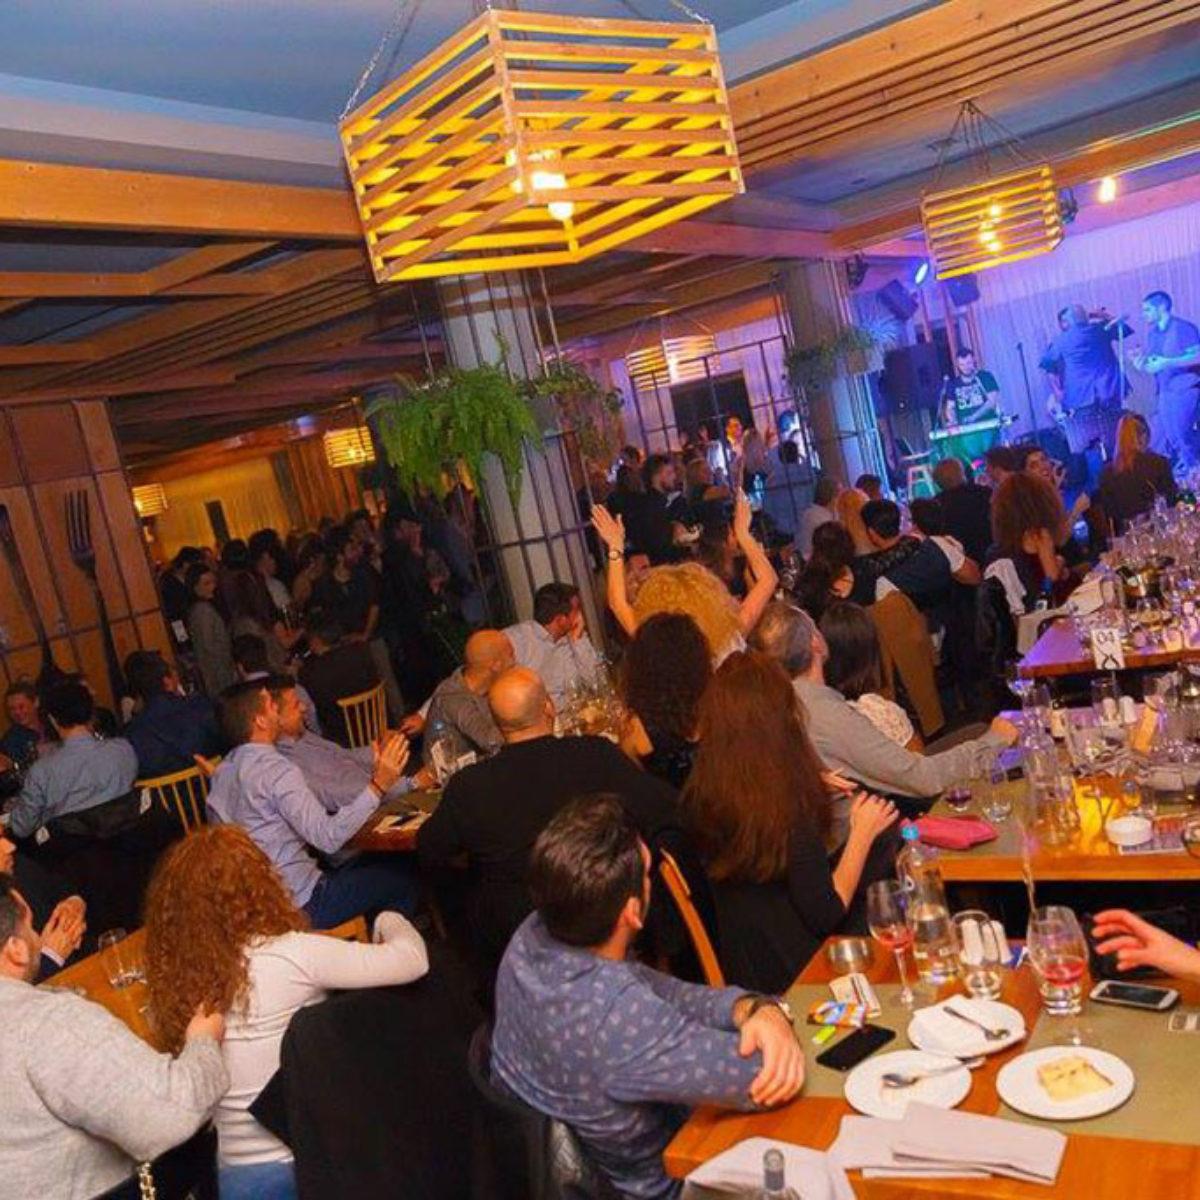 Yiamas Gastro Bar - Καλαμάτα - Μοντέρνα Ευρωπαϊκή Κουζίνα - Live events 9